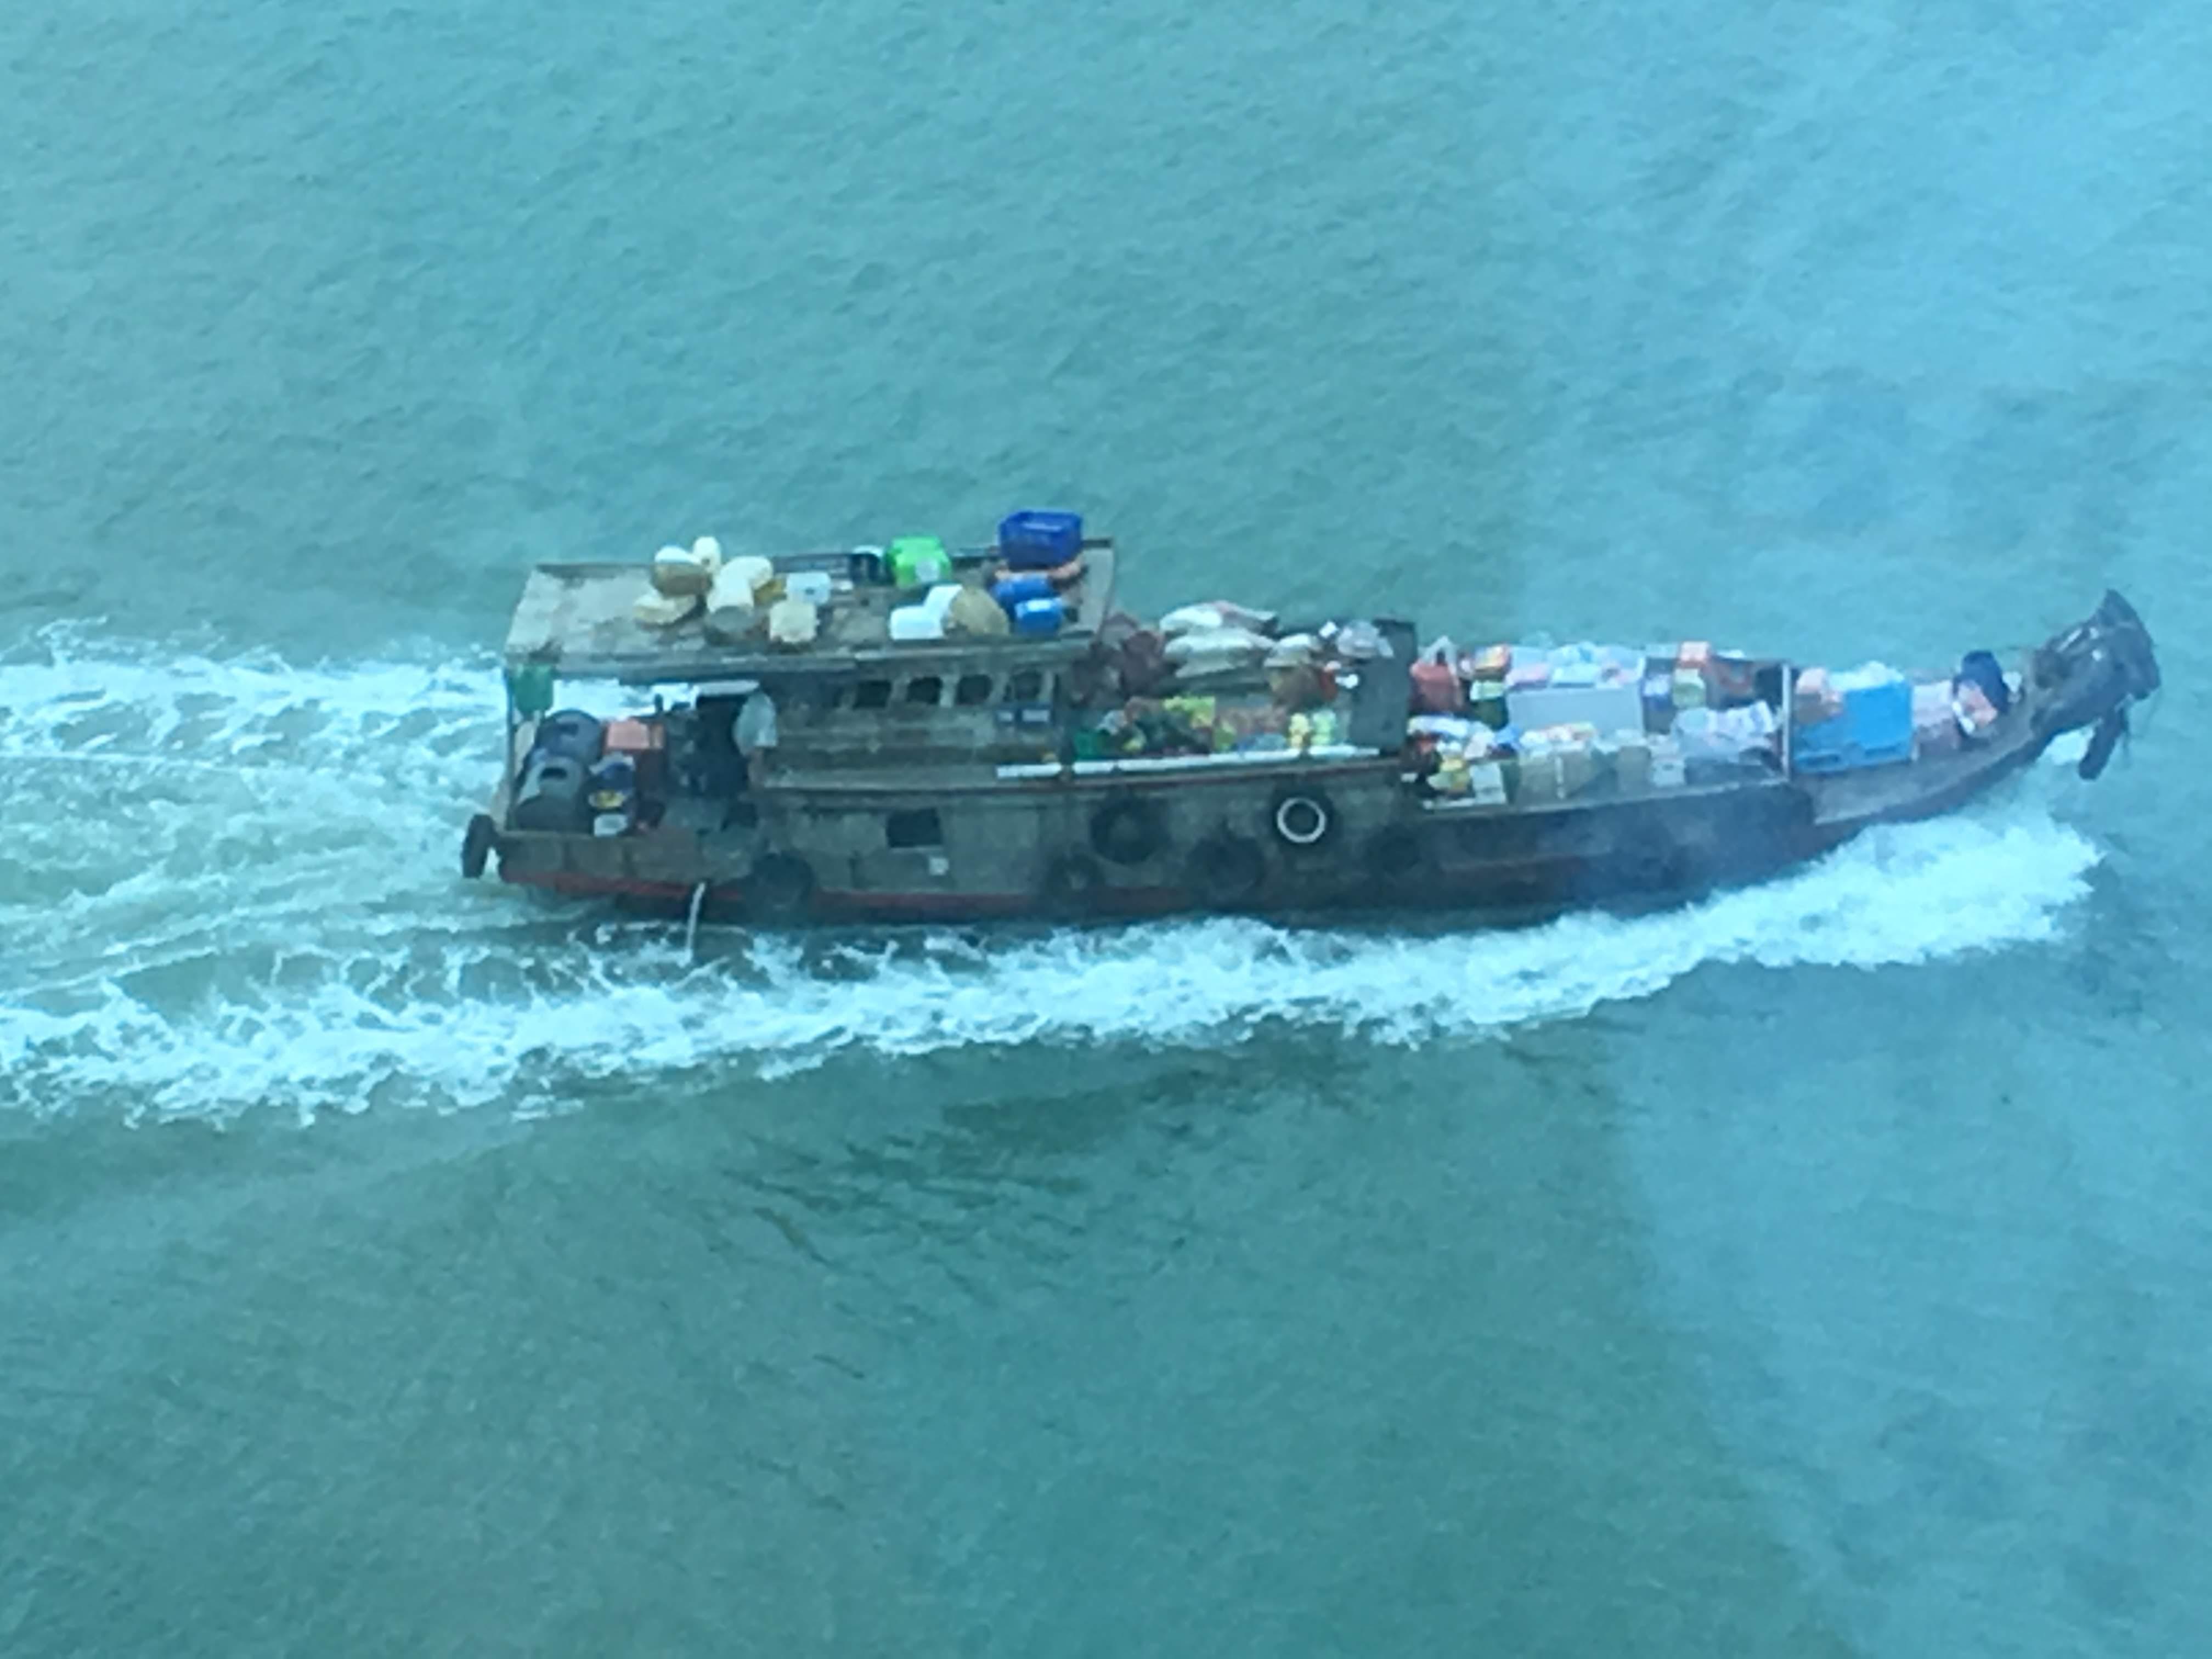 Phu Myの港から見た日常品を運搬する船